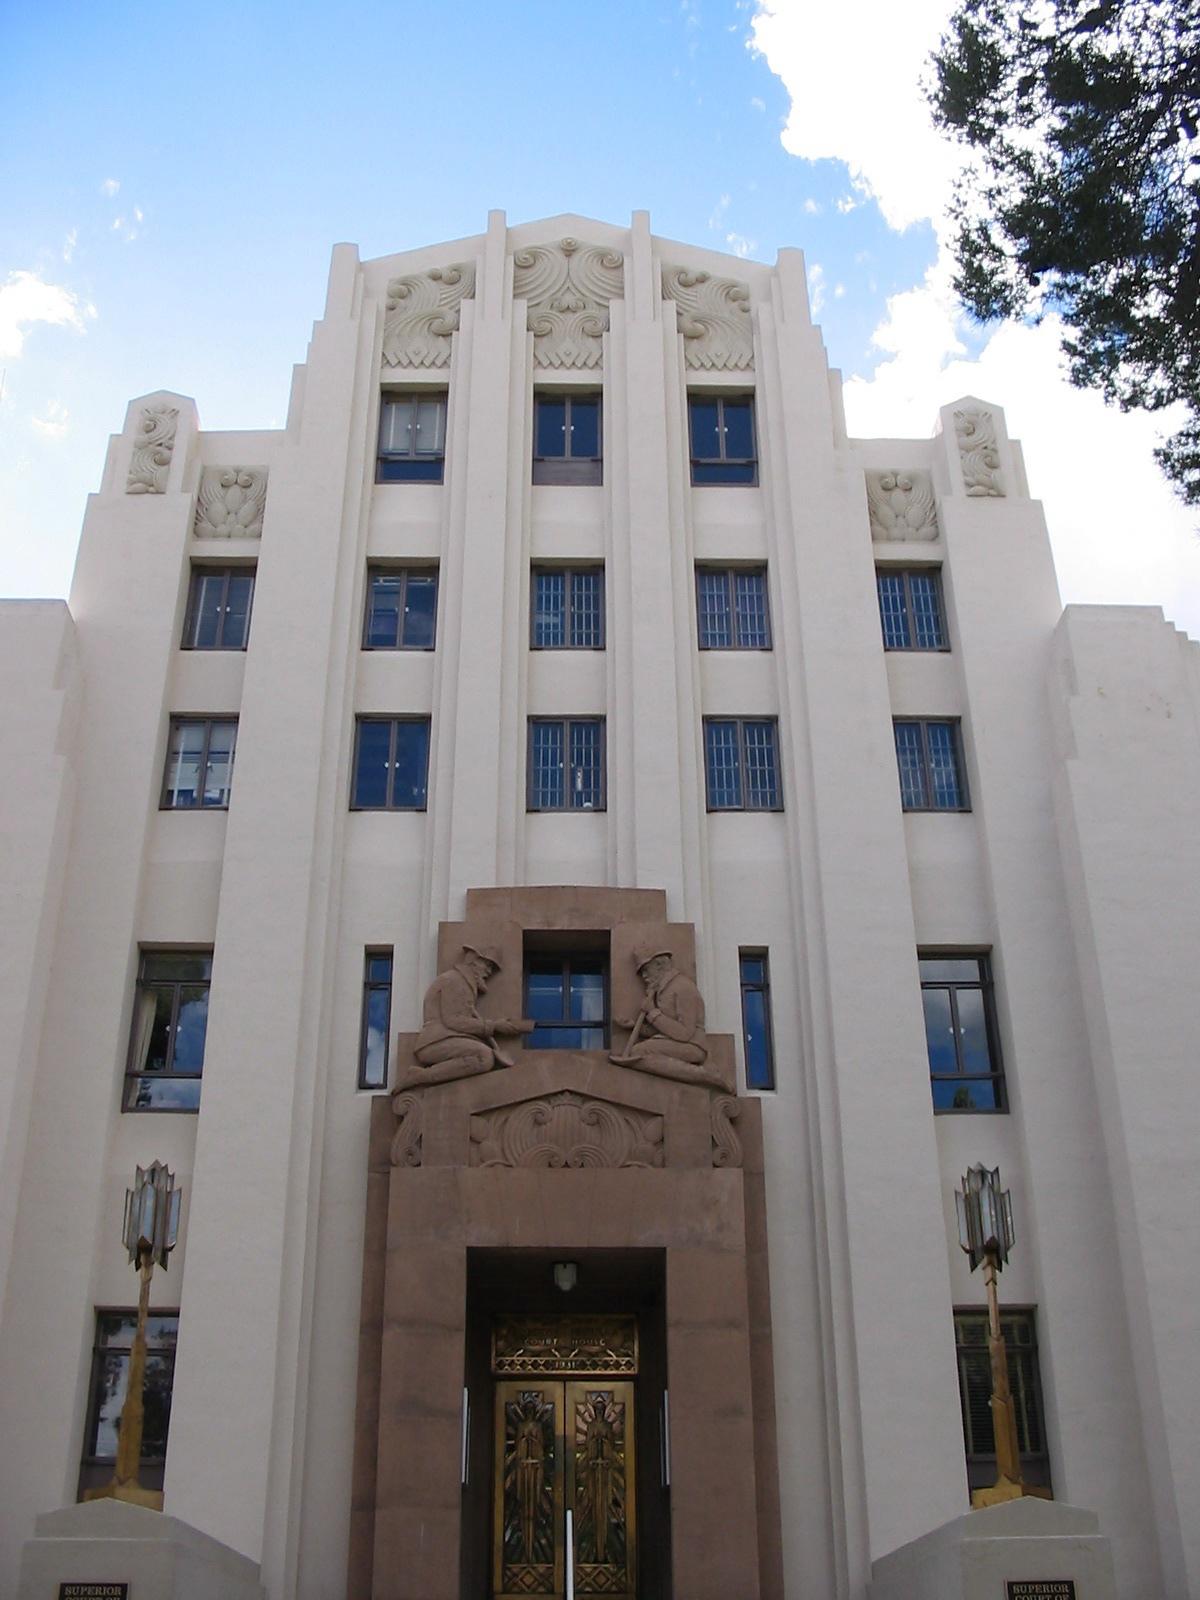 FileCochise County courthouse Bisbee Arizonajpg